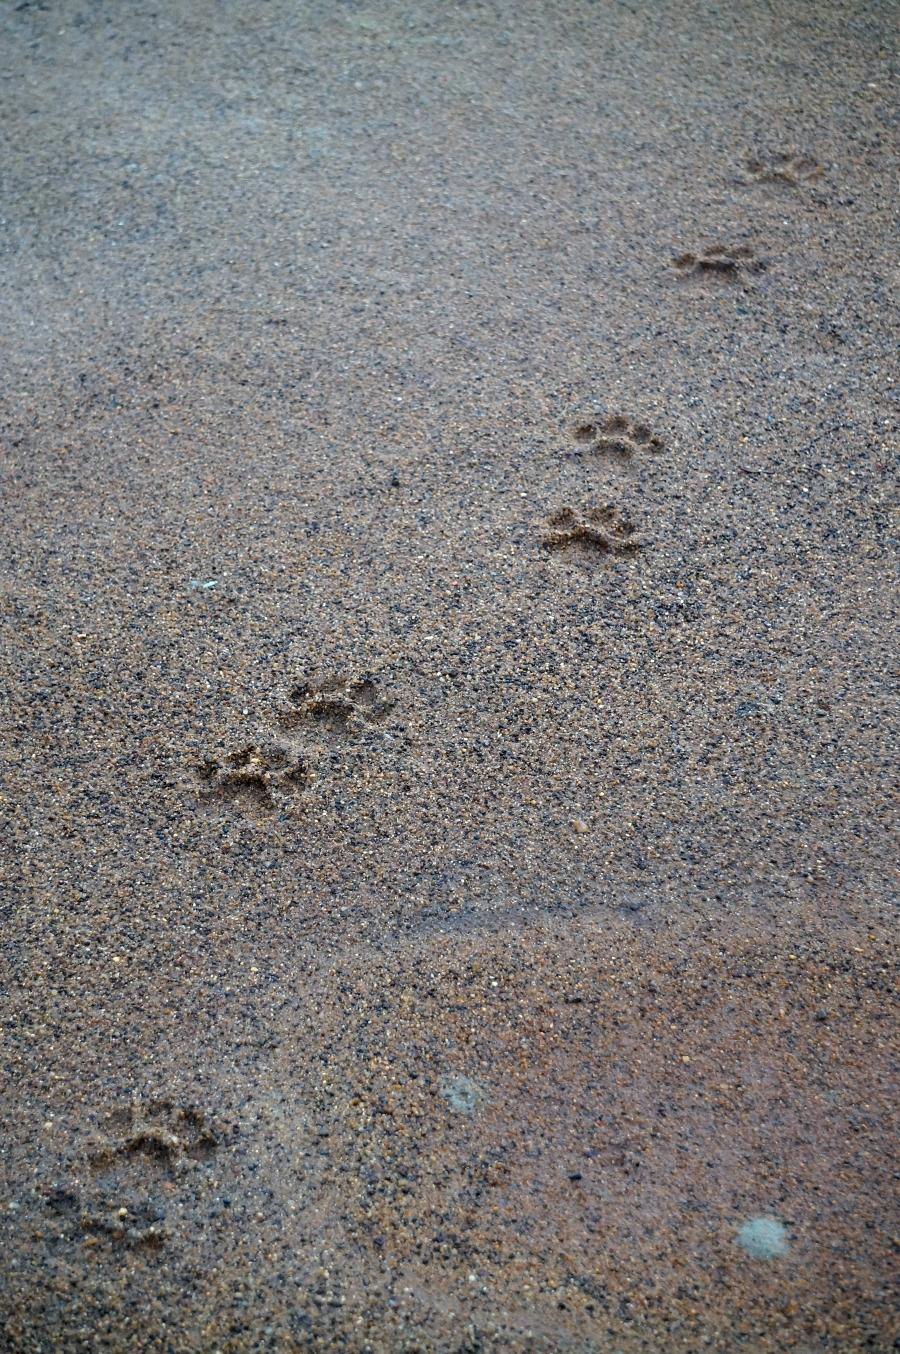 yala-leopard-tracks-01